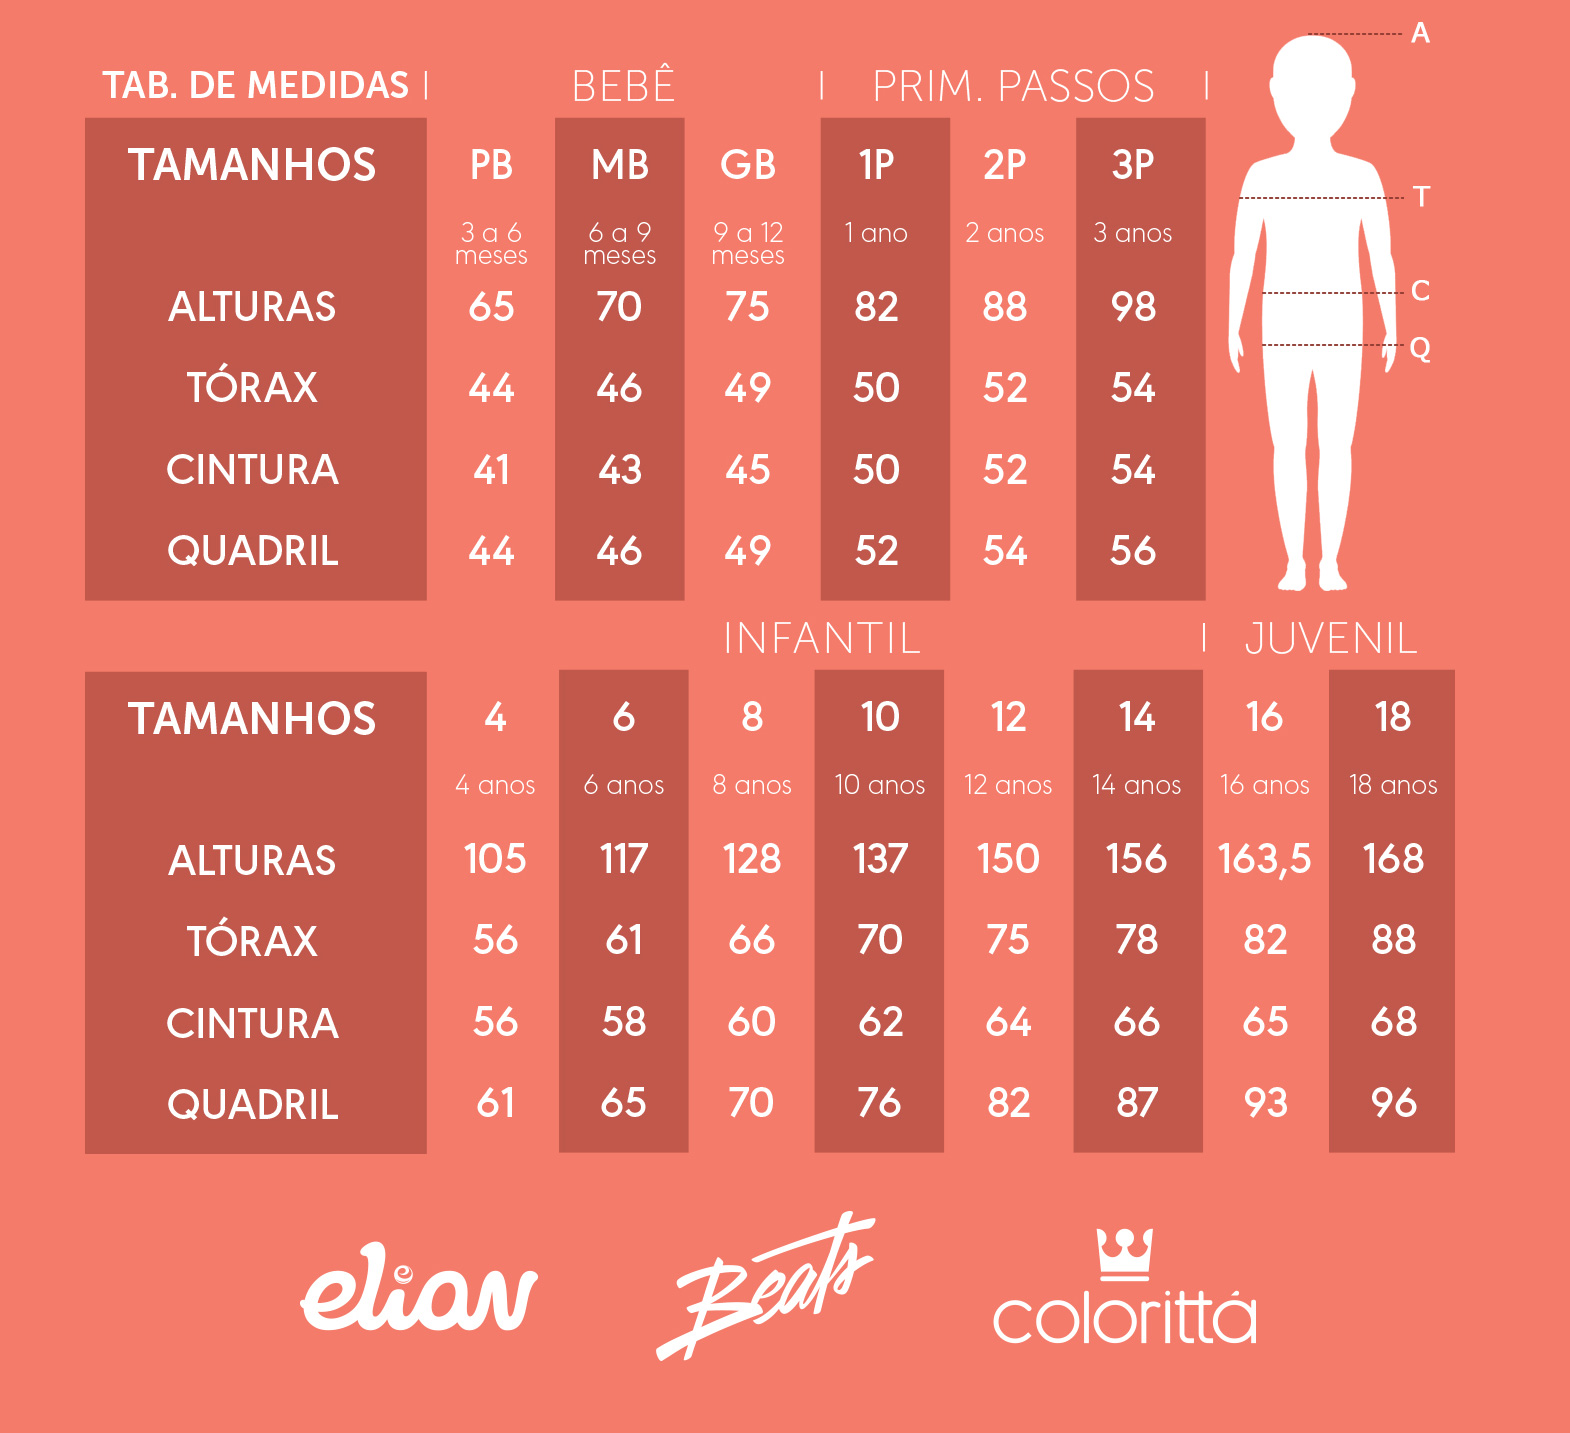 Pijama Infantil Unissex Inverno Azul Poá - Elian: Tabela de medidas